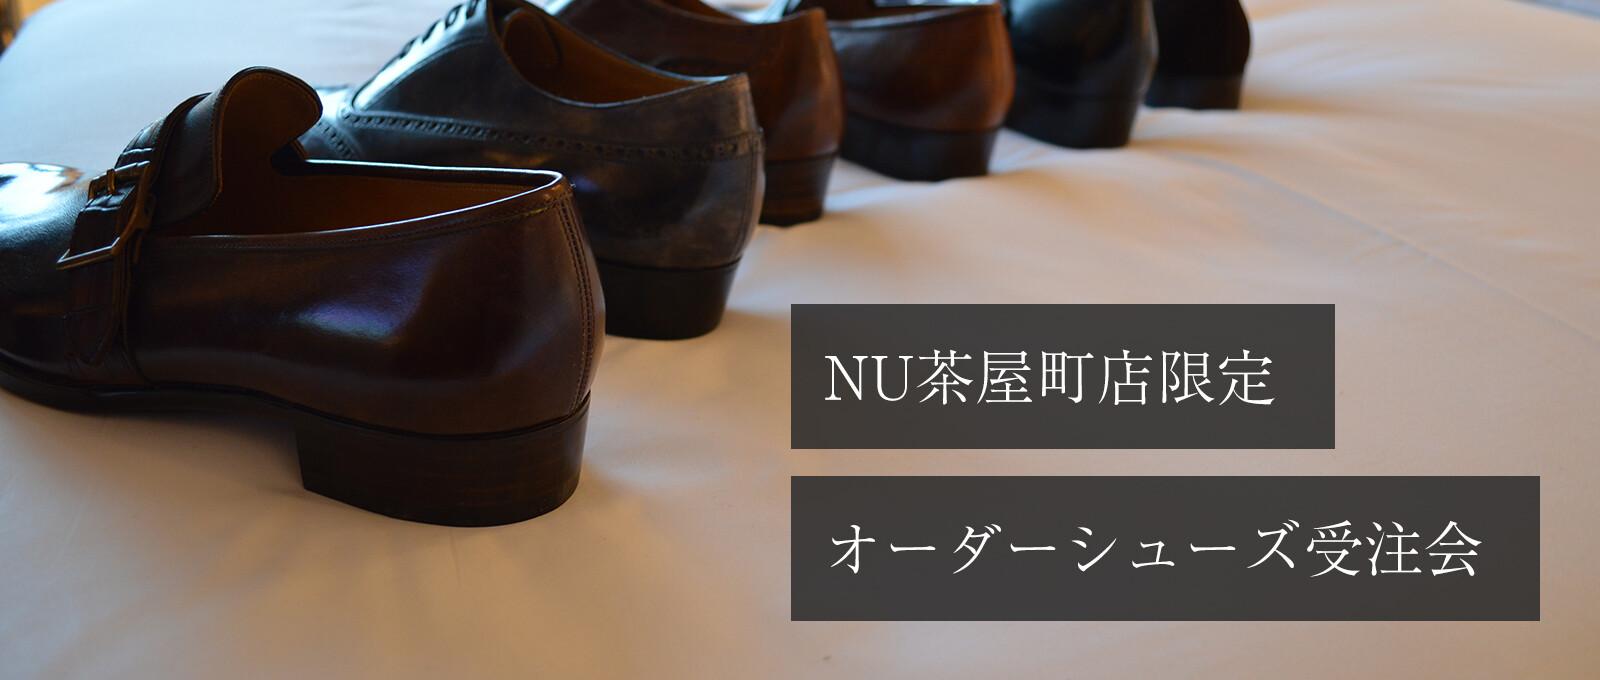 NU茶屋町店オーダーシューズ受注会